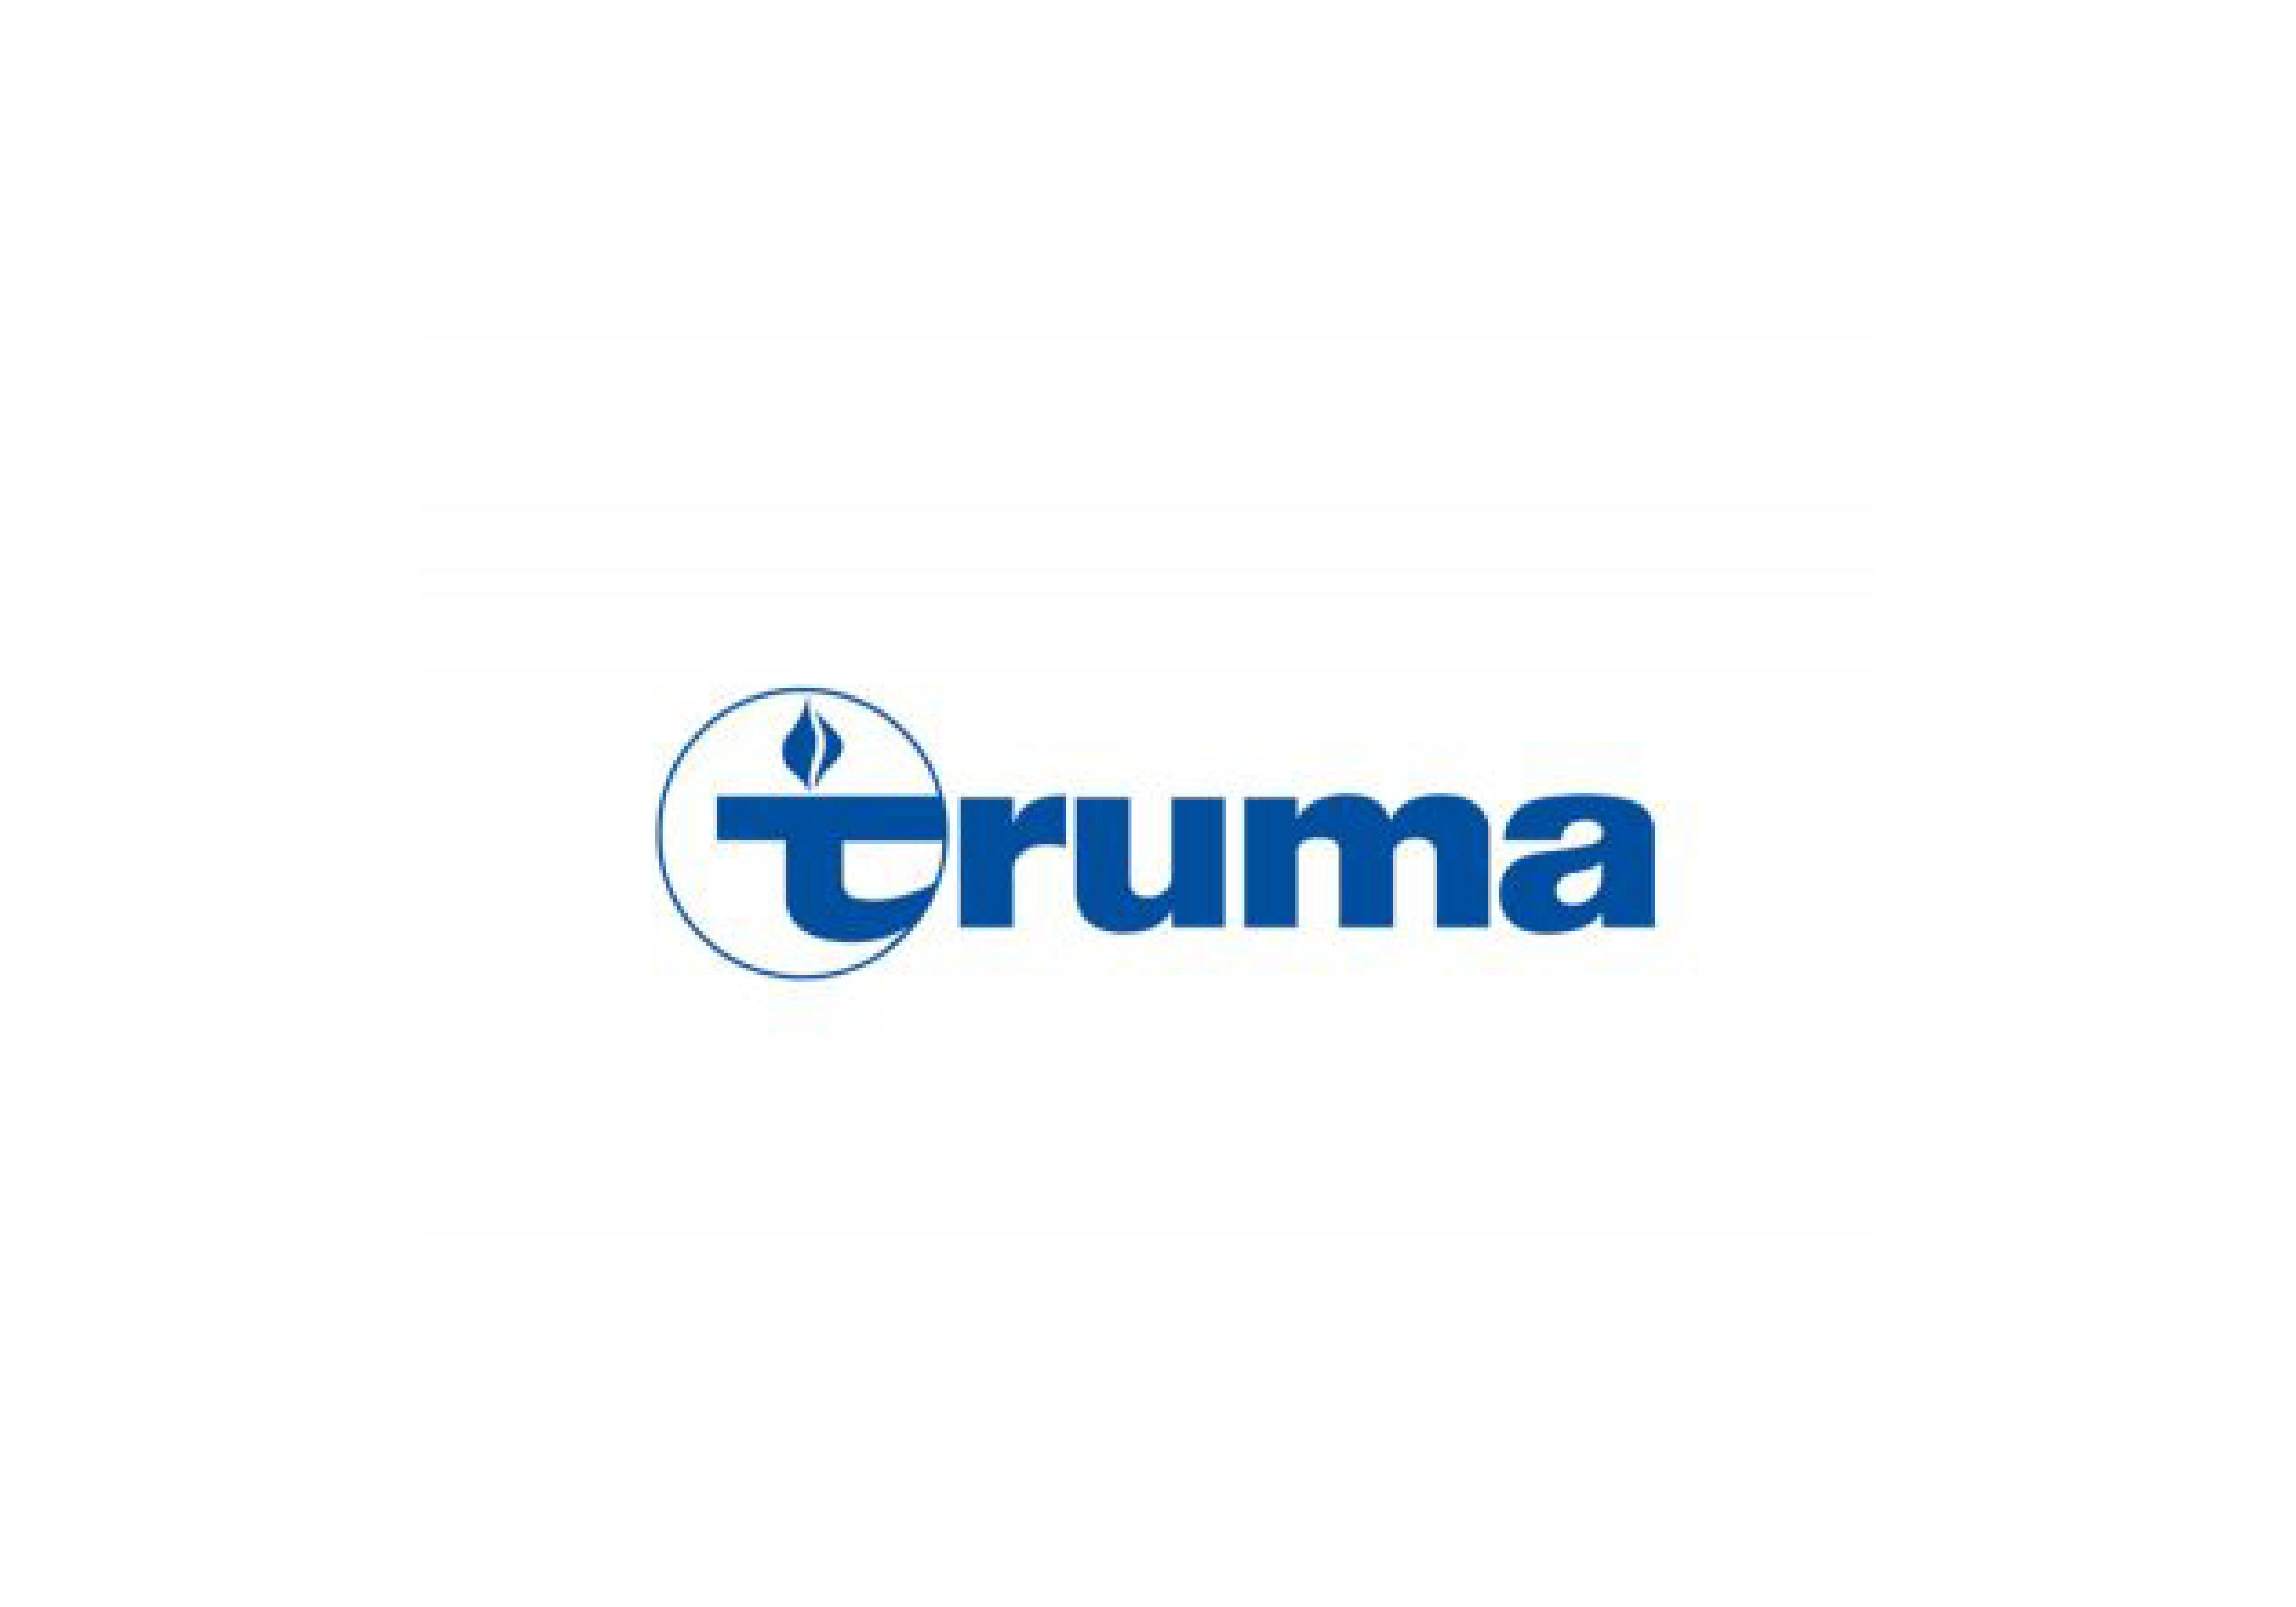 truma-01